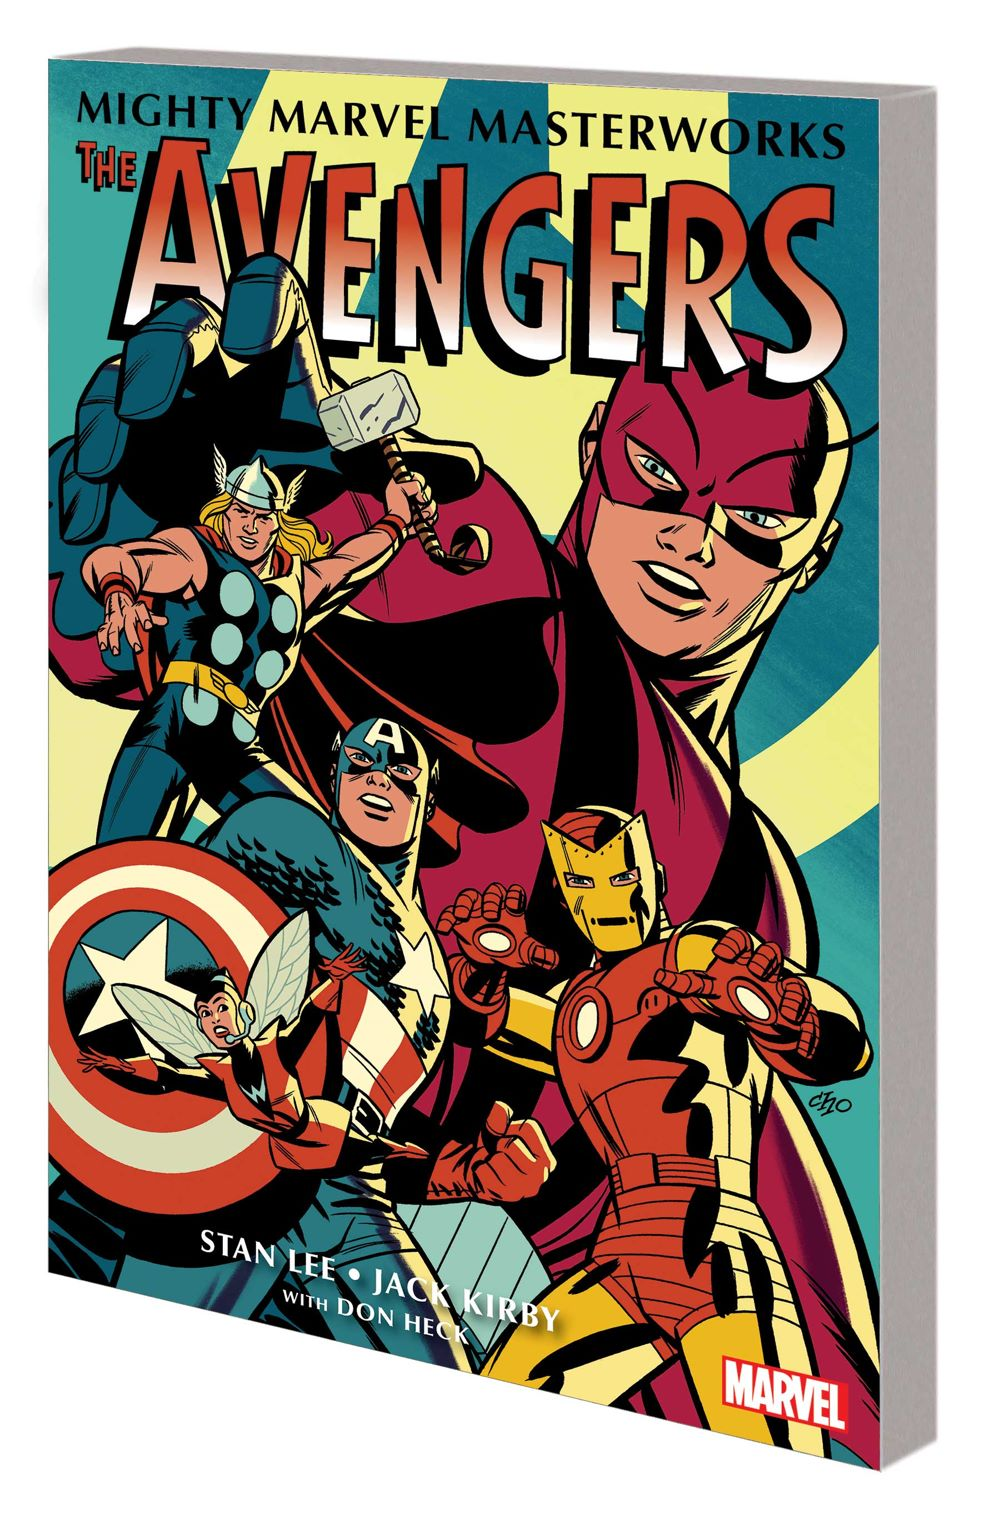 MM_AVEN_VOL_1_GN_CHO Marvel Comics August 2021 Solicitations